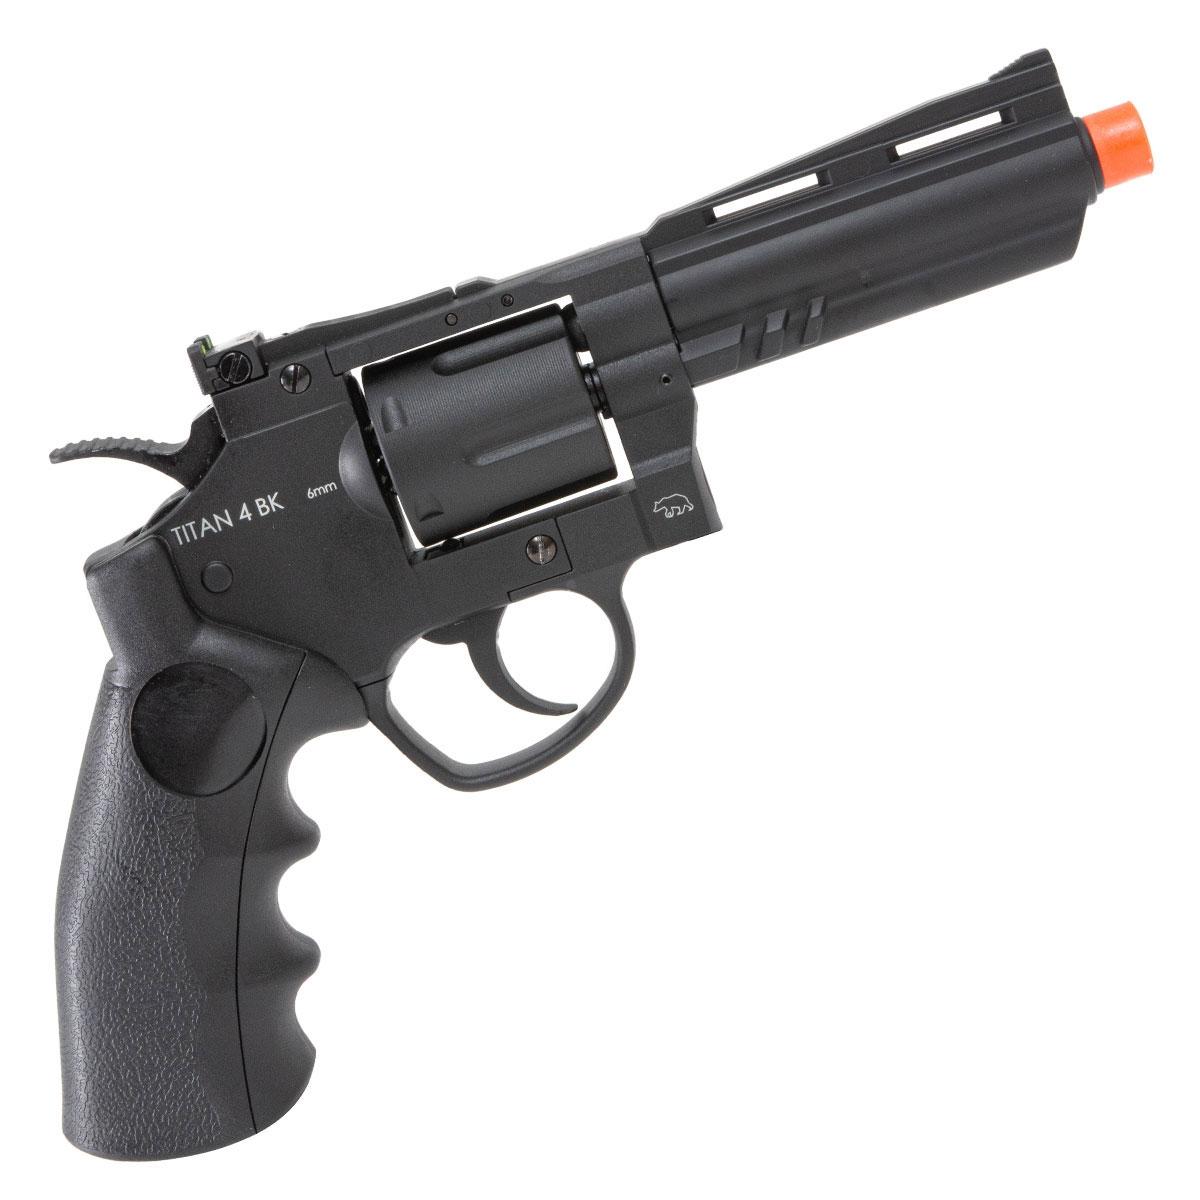 Revolver de Airsoft Titan 4 BK QGK a Gás Co2